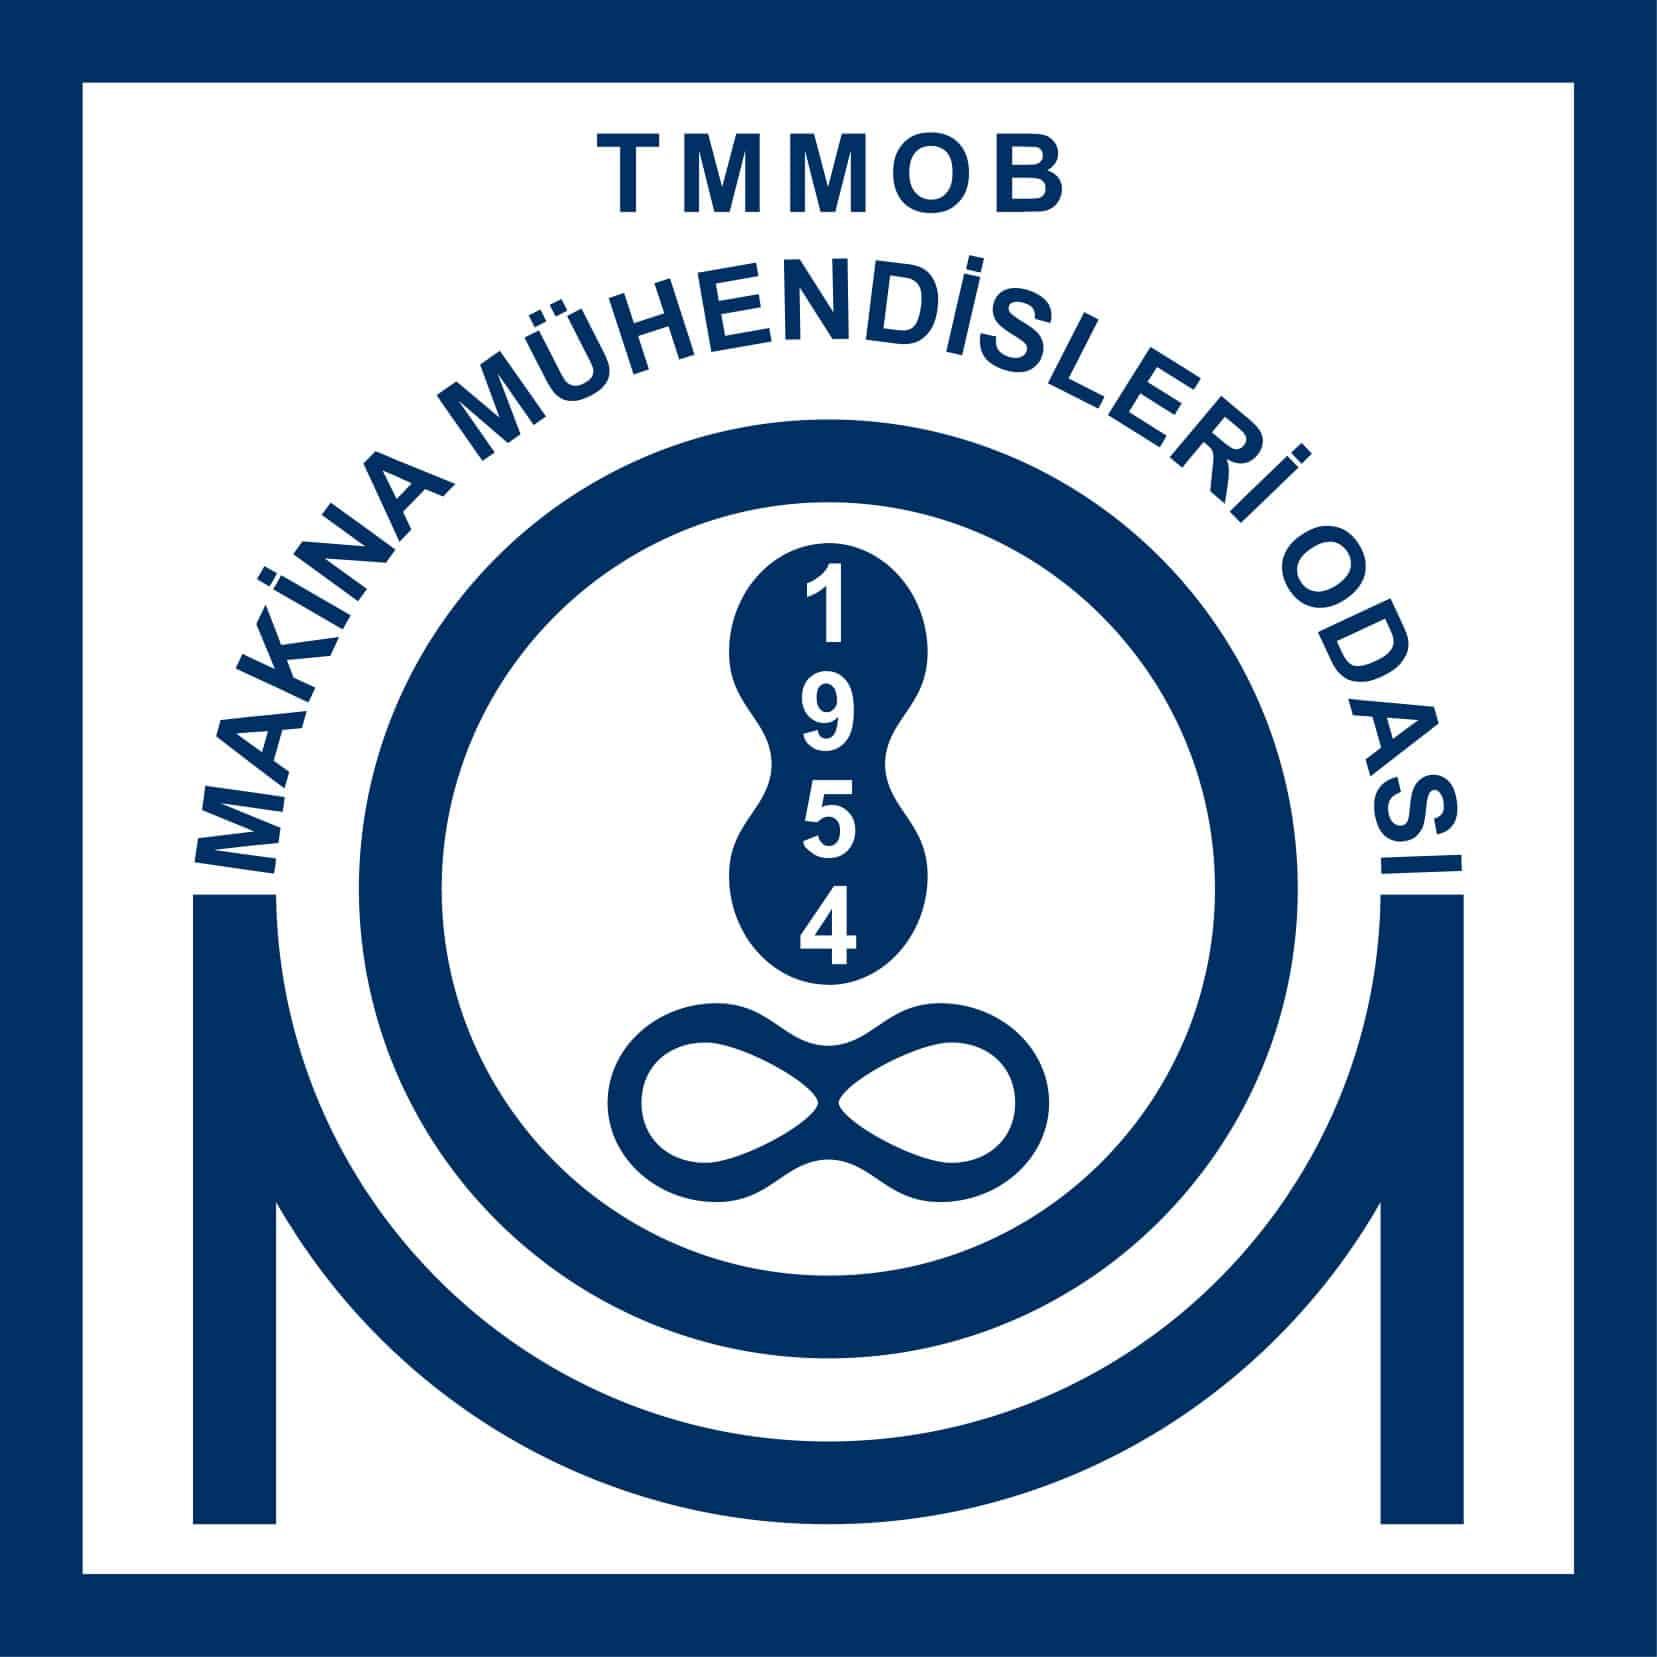 Makina Mühendisleri Odası Logo (TMMOB) png